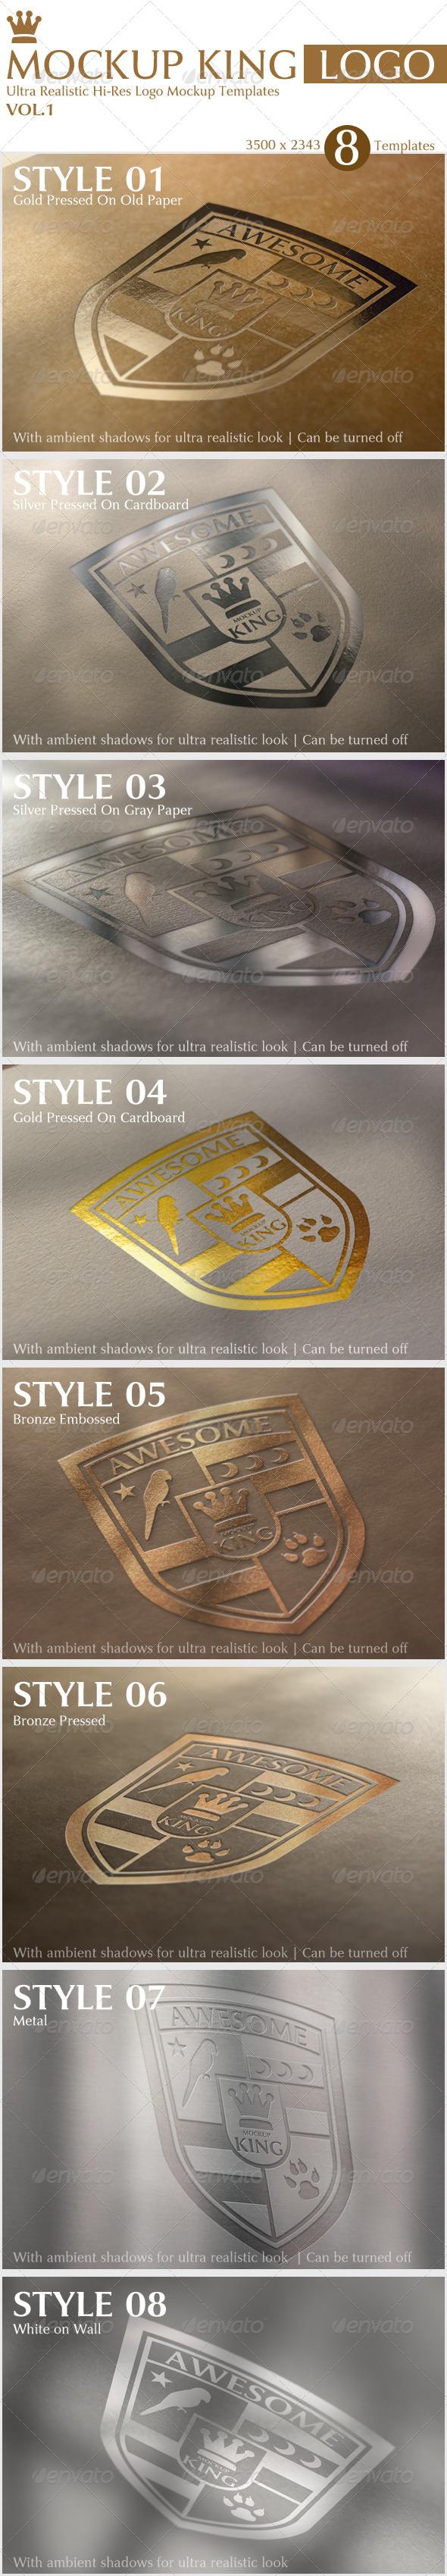 GraphicRiver Mockup King Ultra Realistic Logo Mockup Templates 4079592